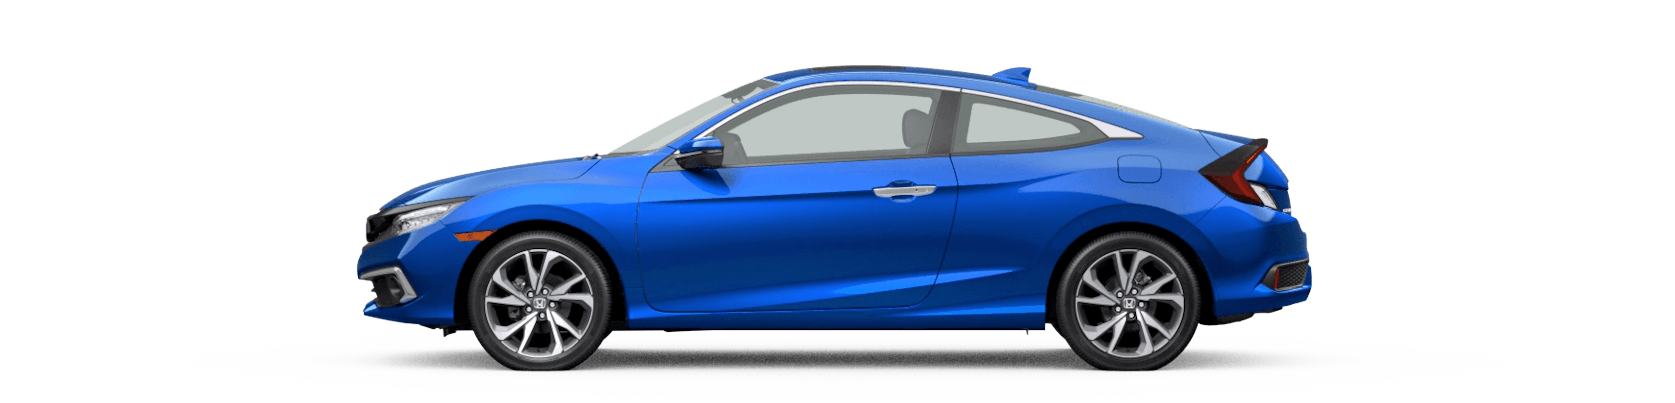 Honda Civic Coupe Awards Jellybean